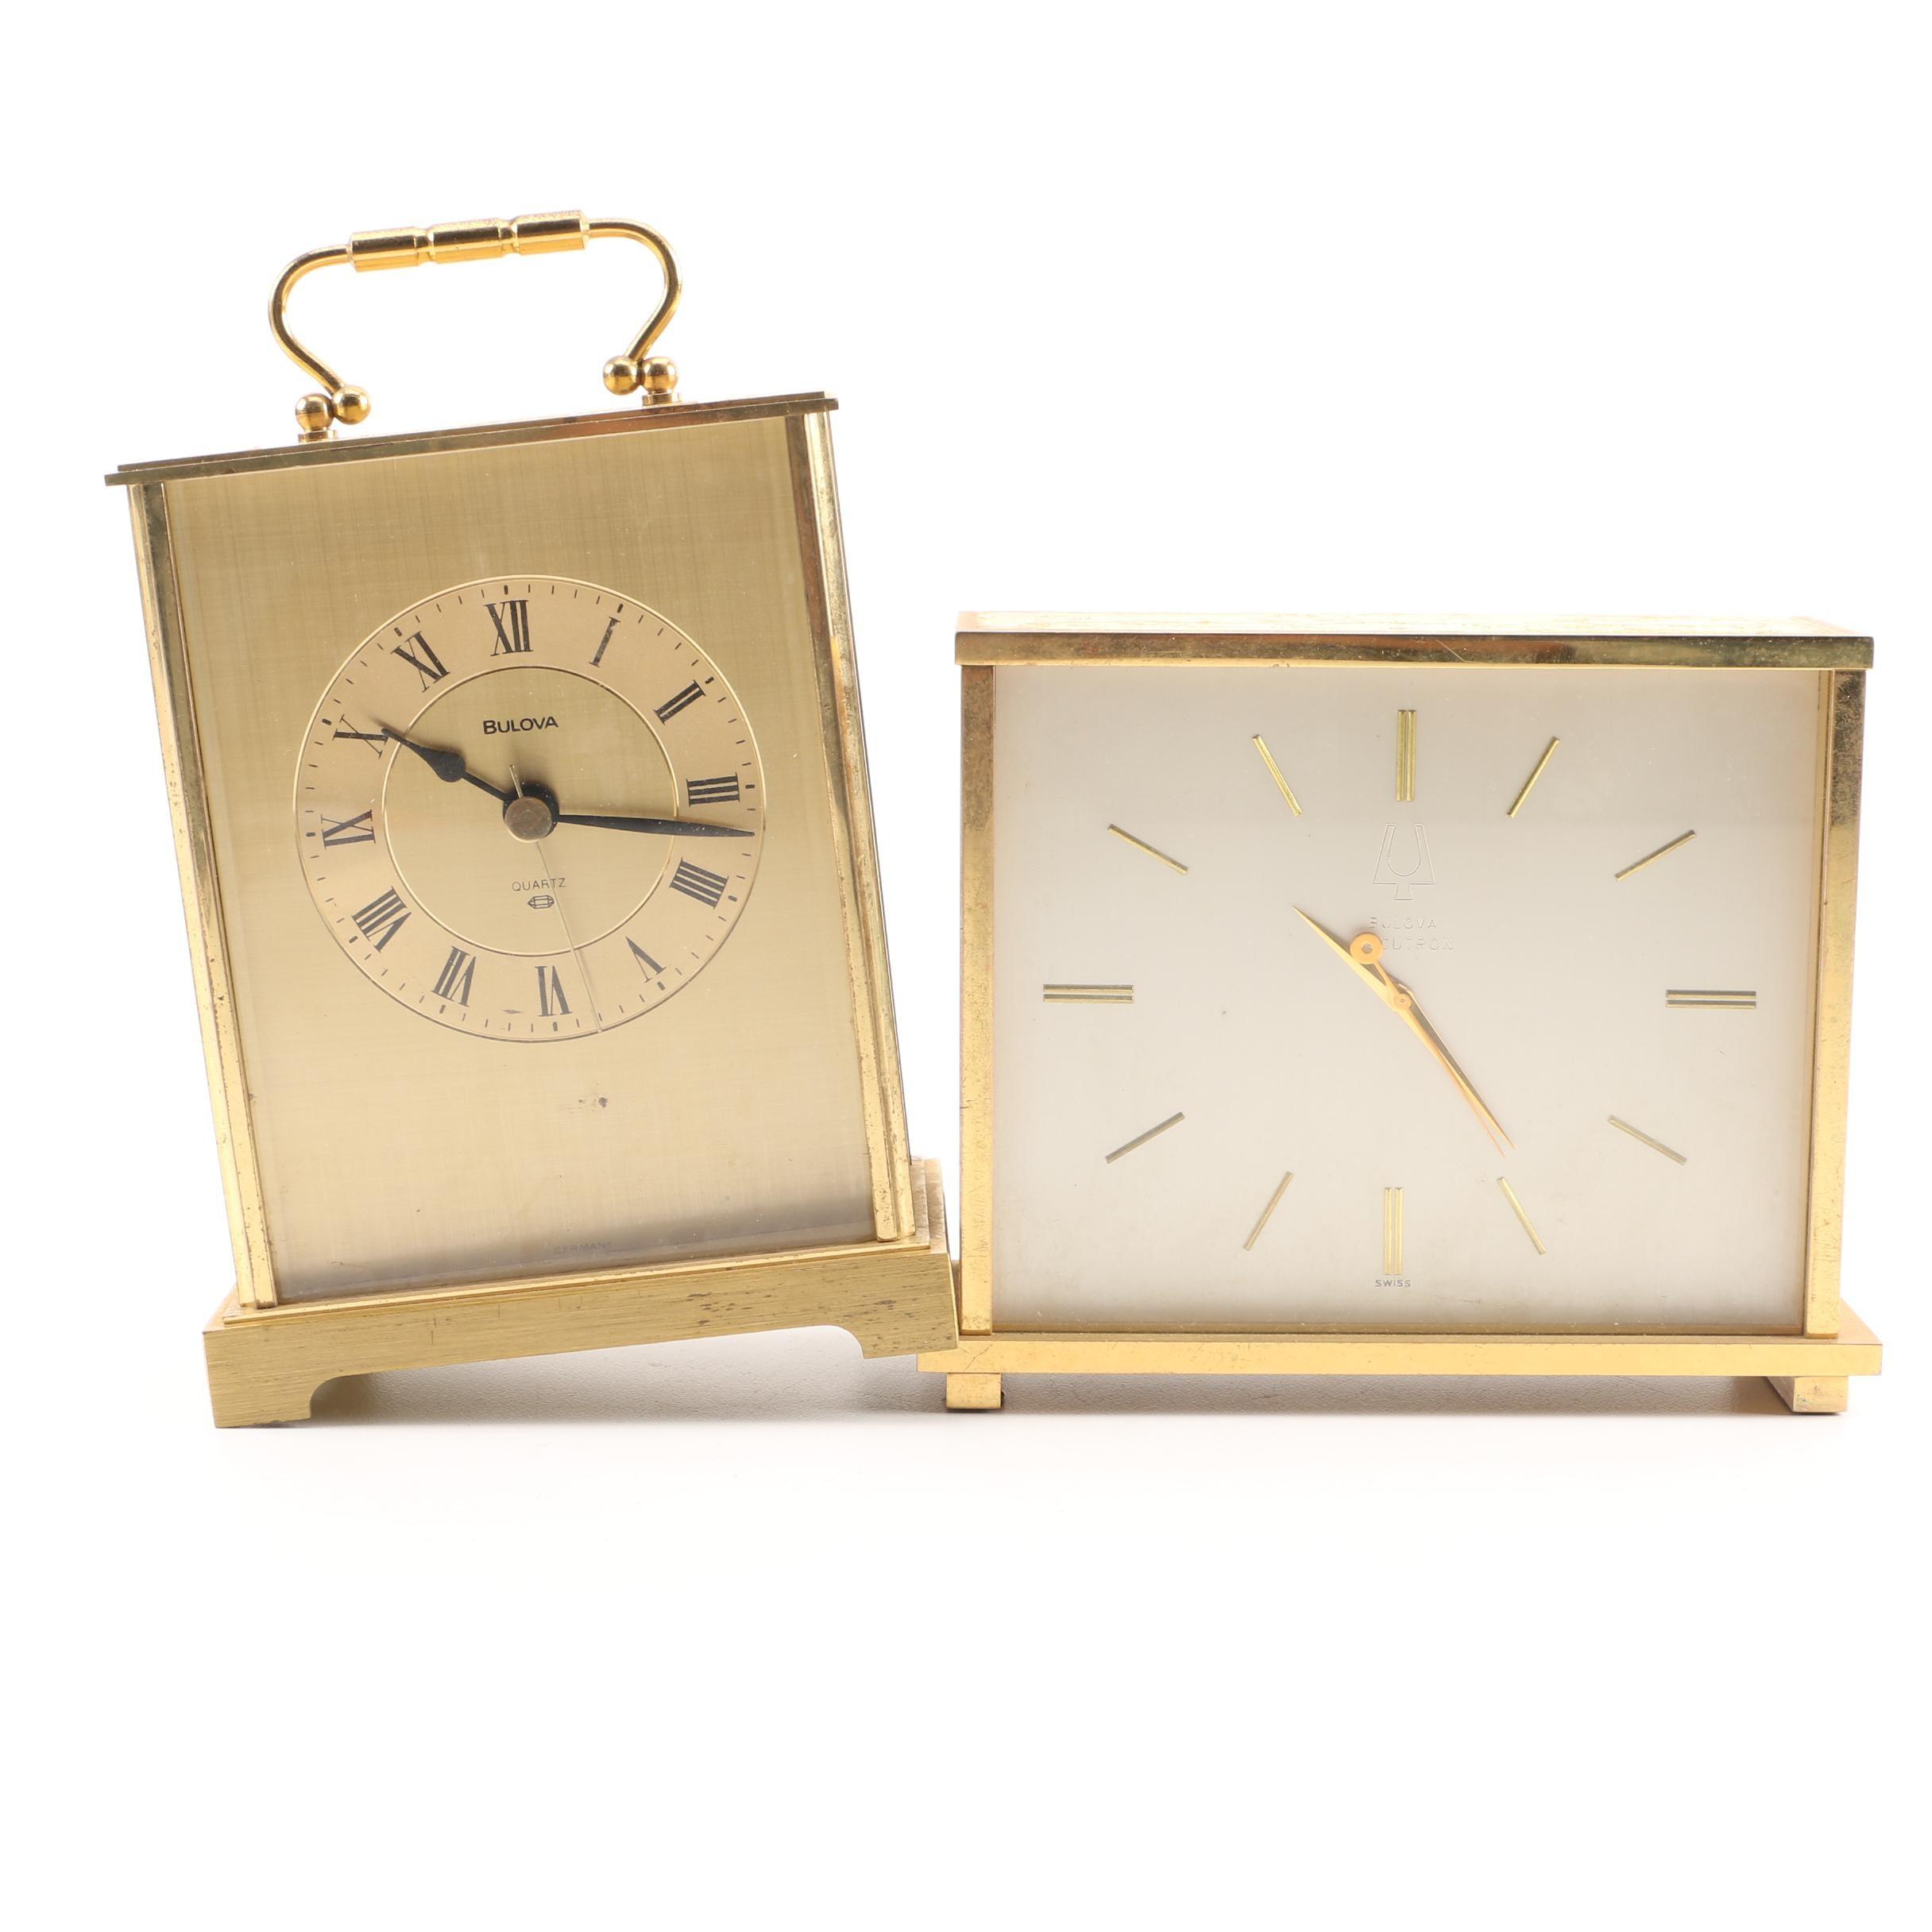 Bulova Gold Tone Shelf Clocks